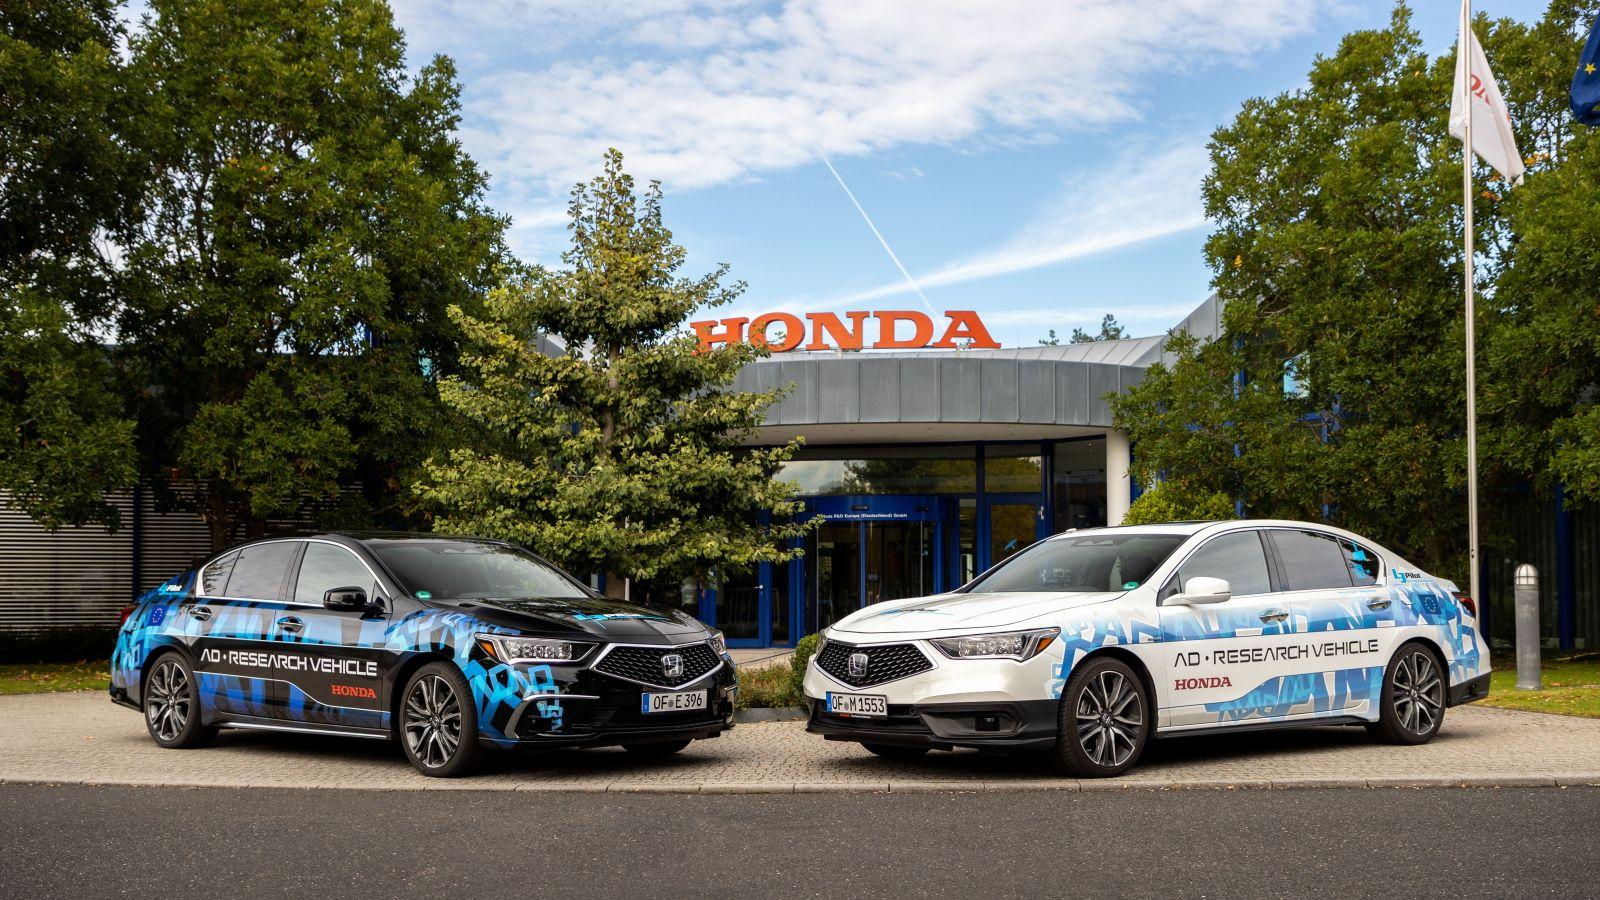 HONDA SHOWCASES AUTOMATED DRIVING TECHNOLOGY AT ITS WORLD CONGRESS 2021